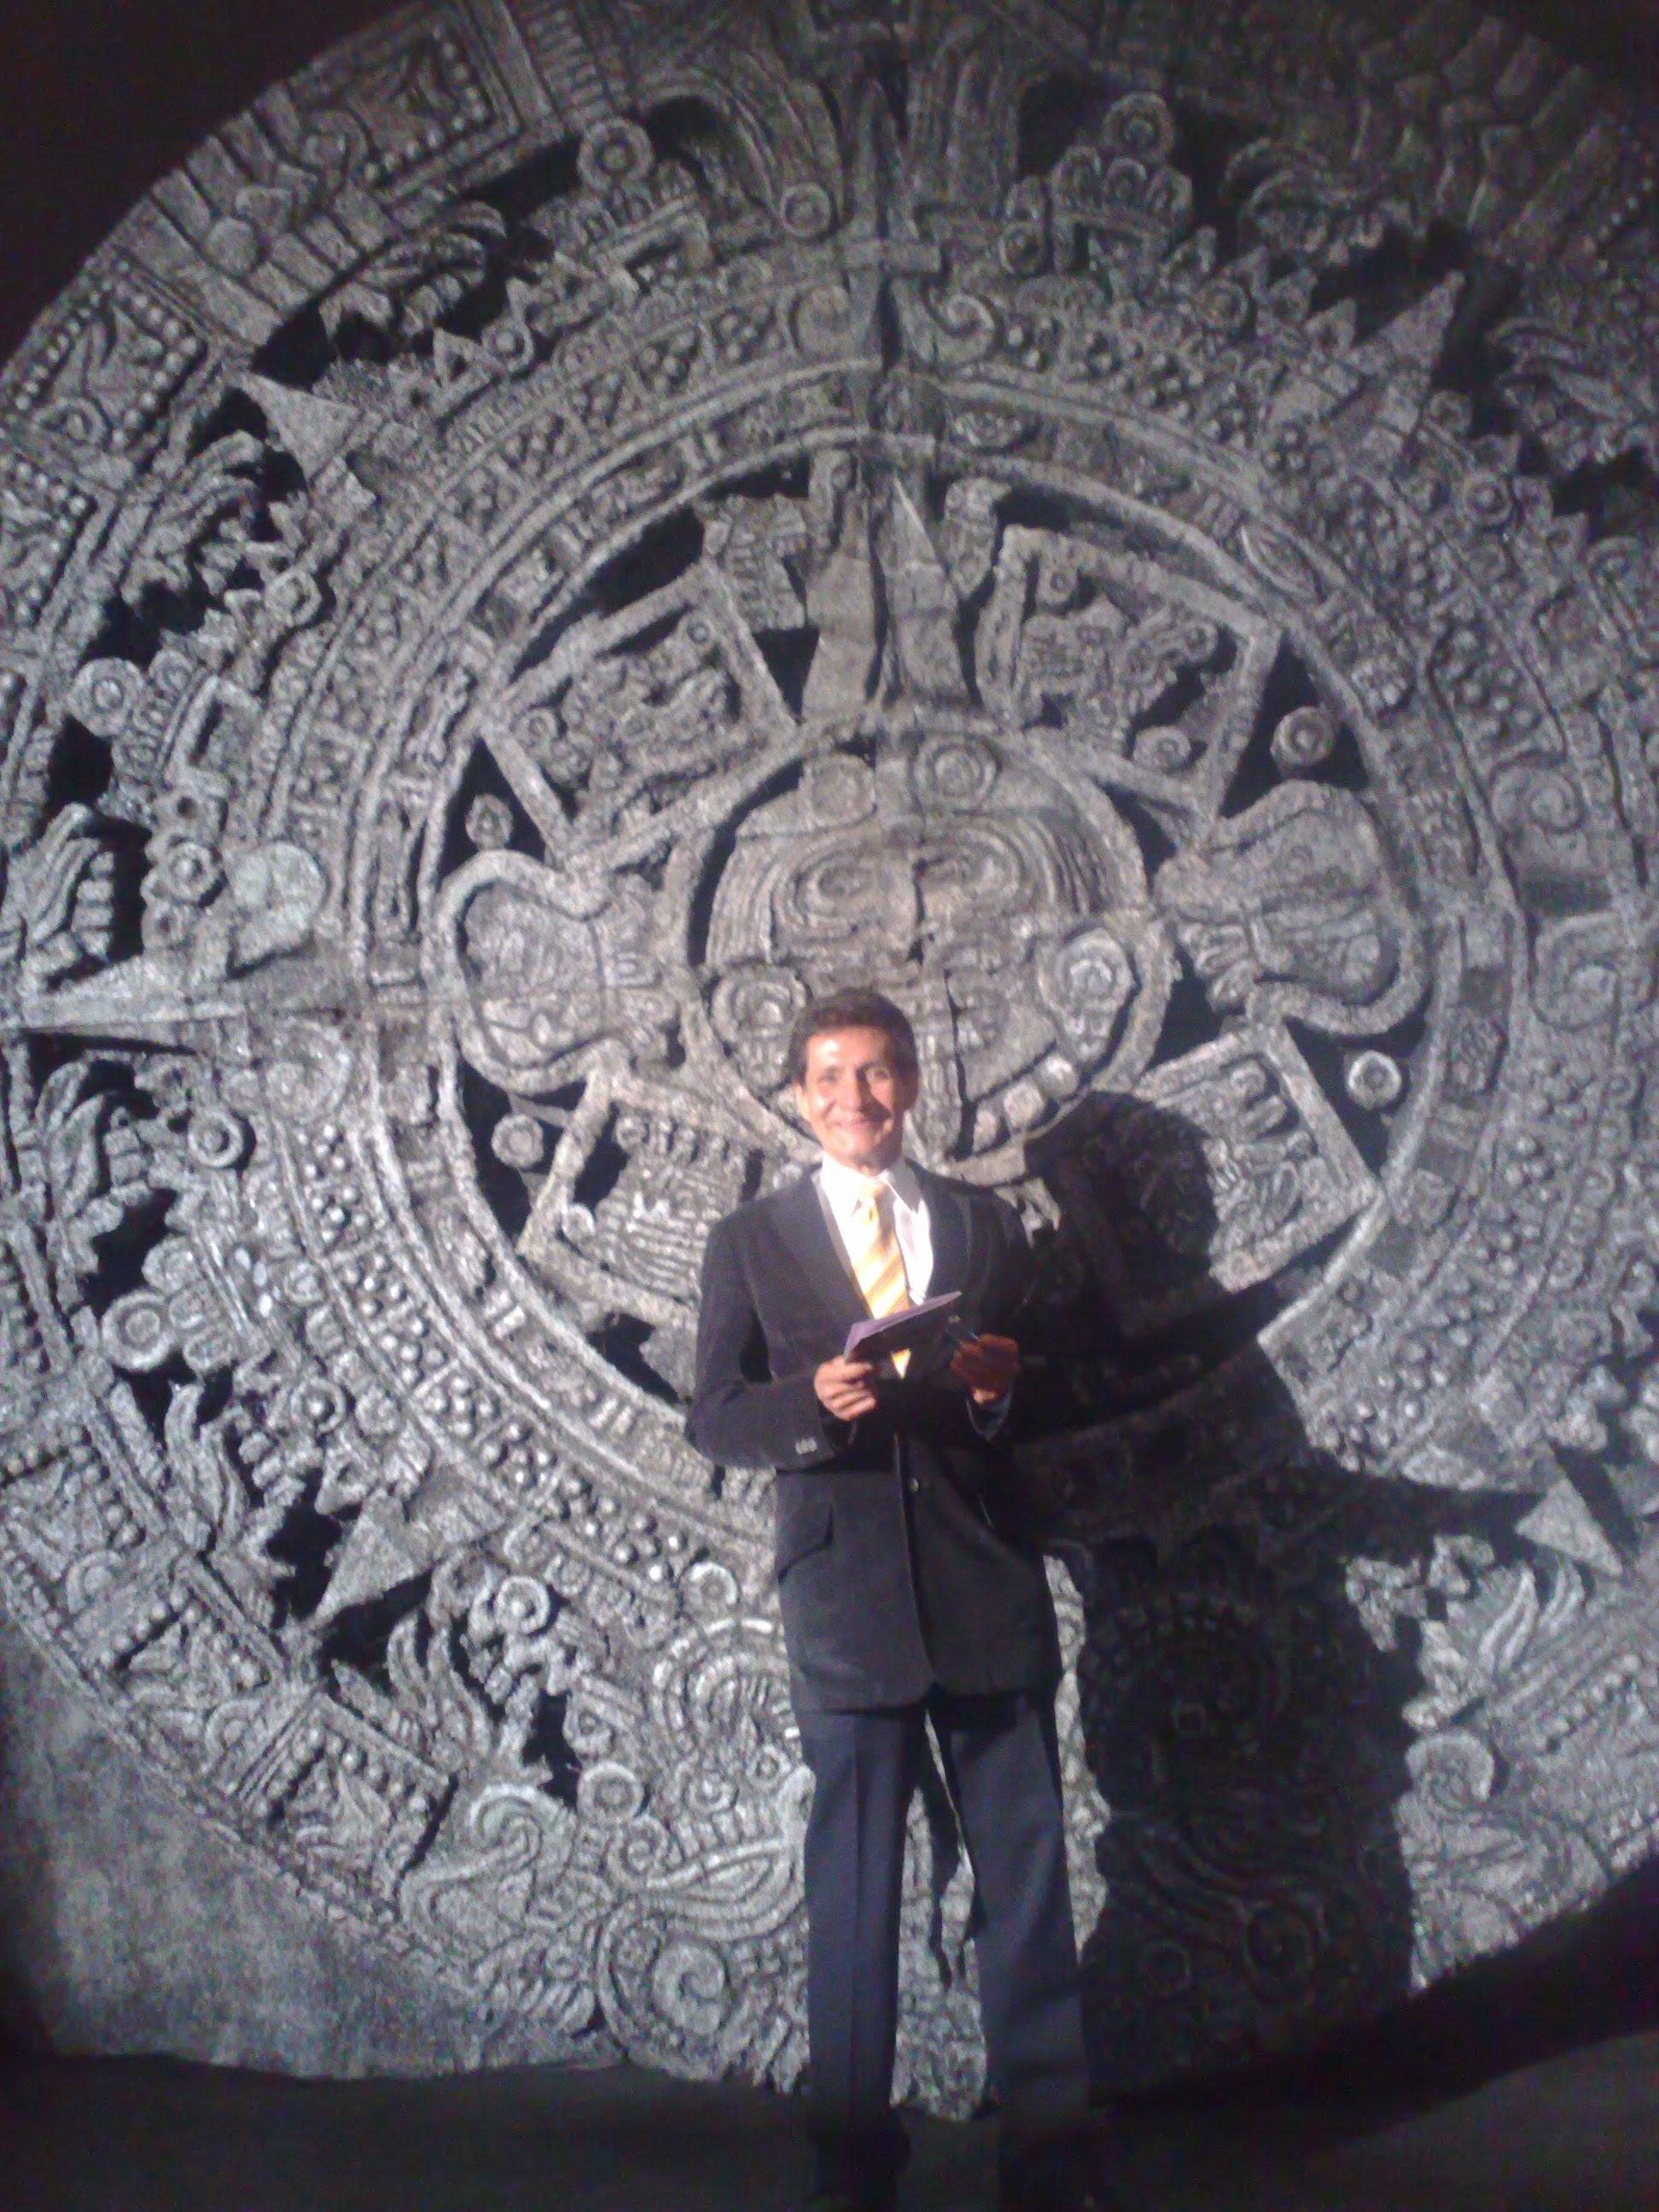 Calendario Azteca Original Donde Esta Agcrewall